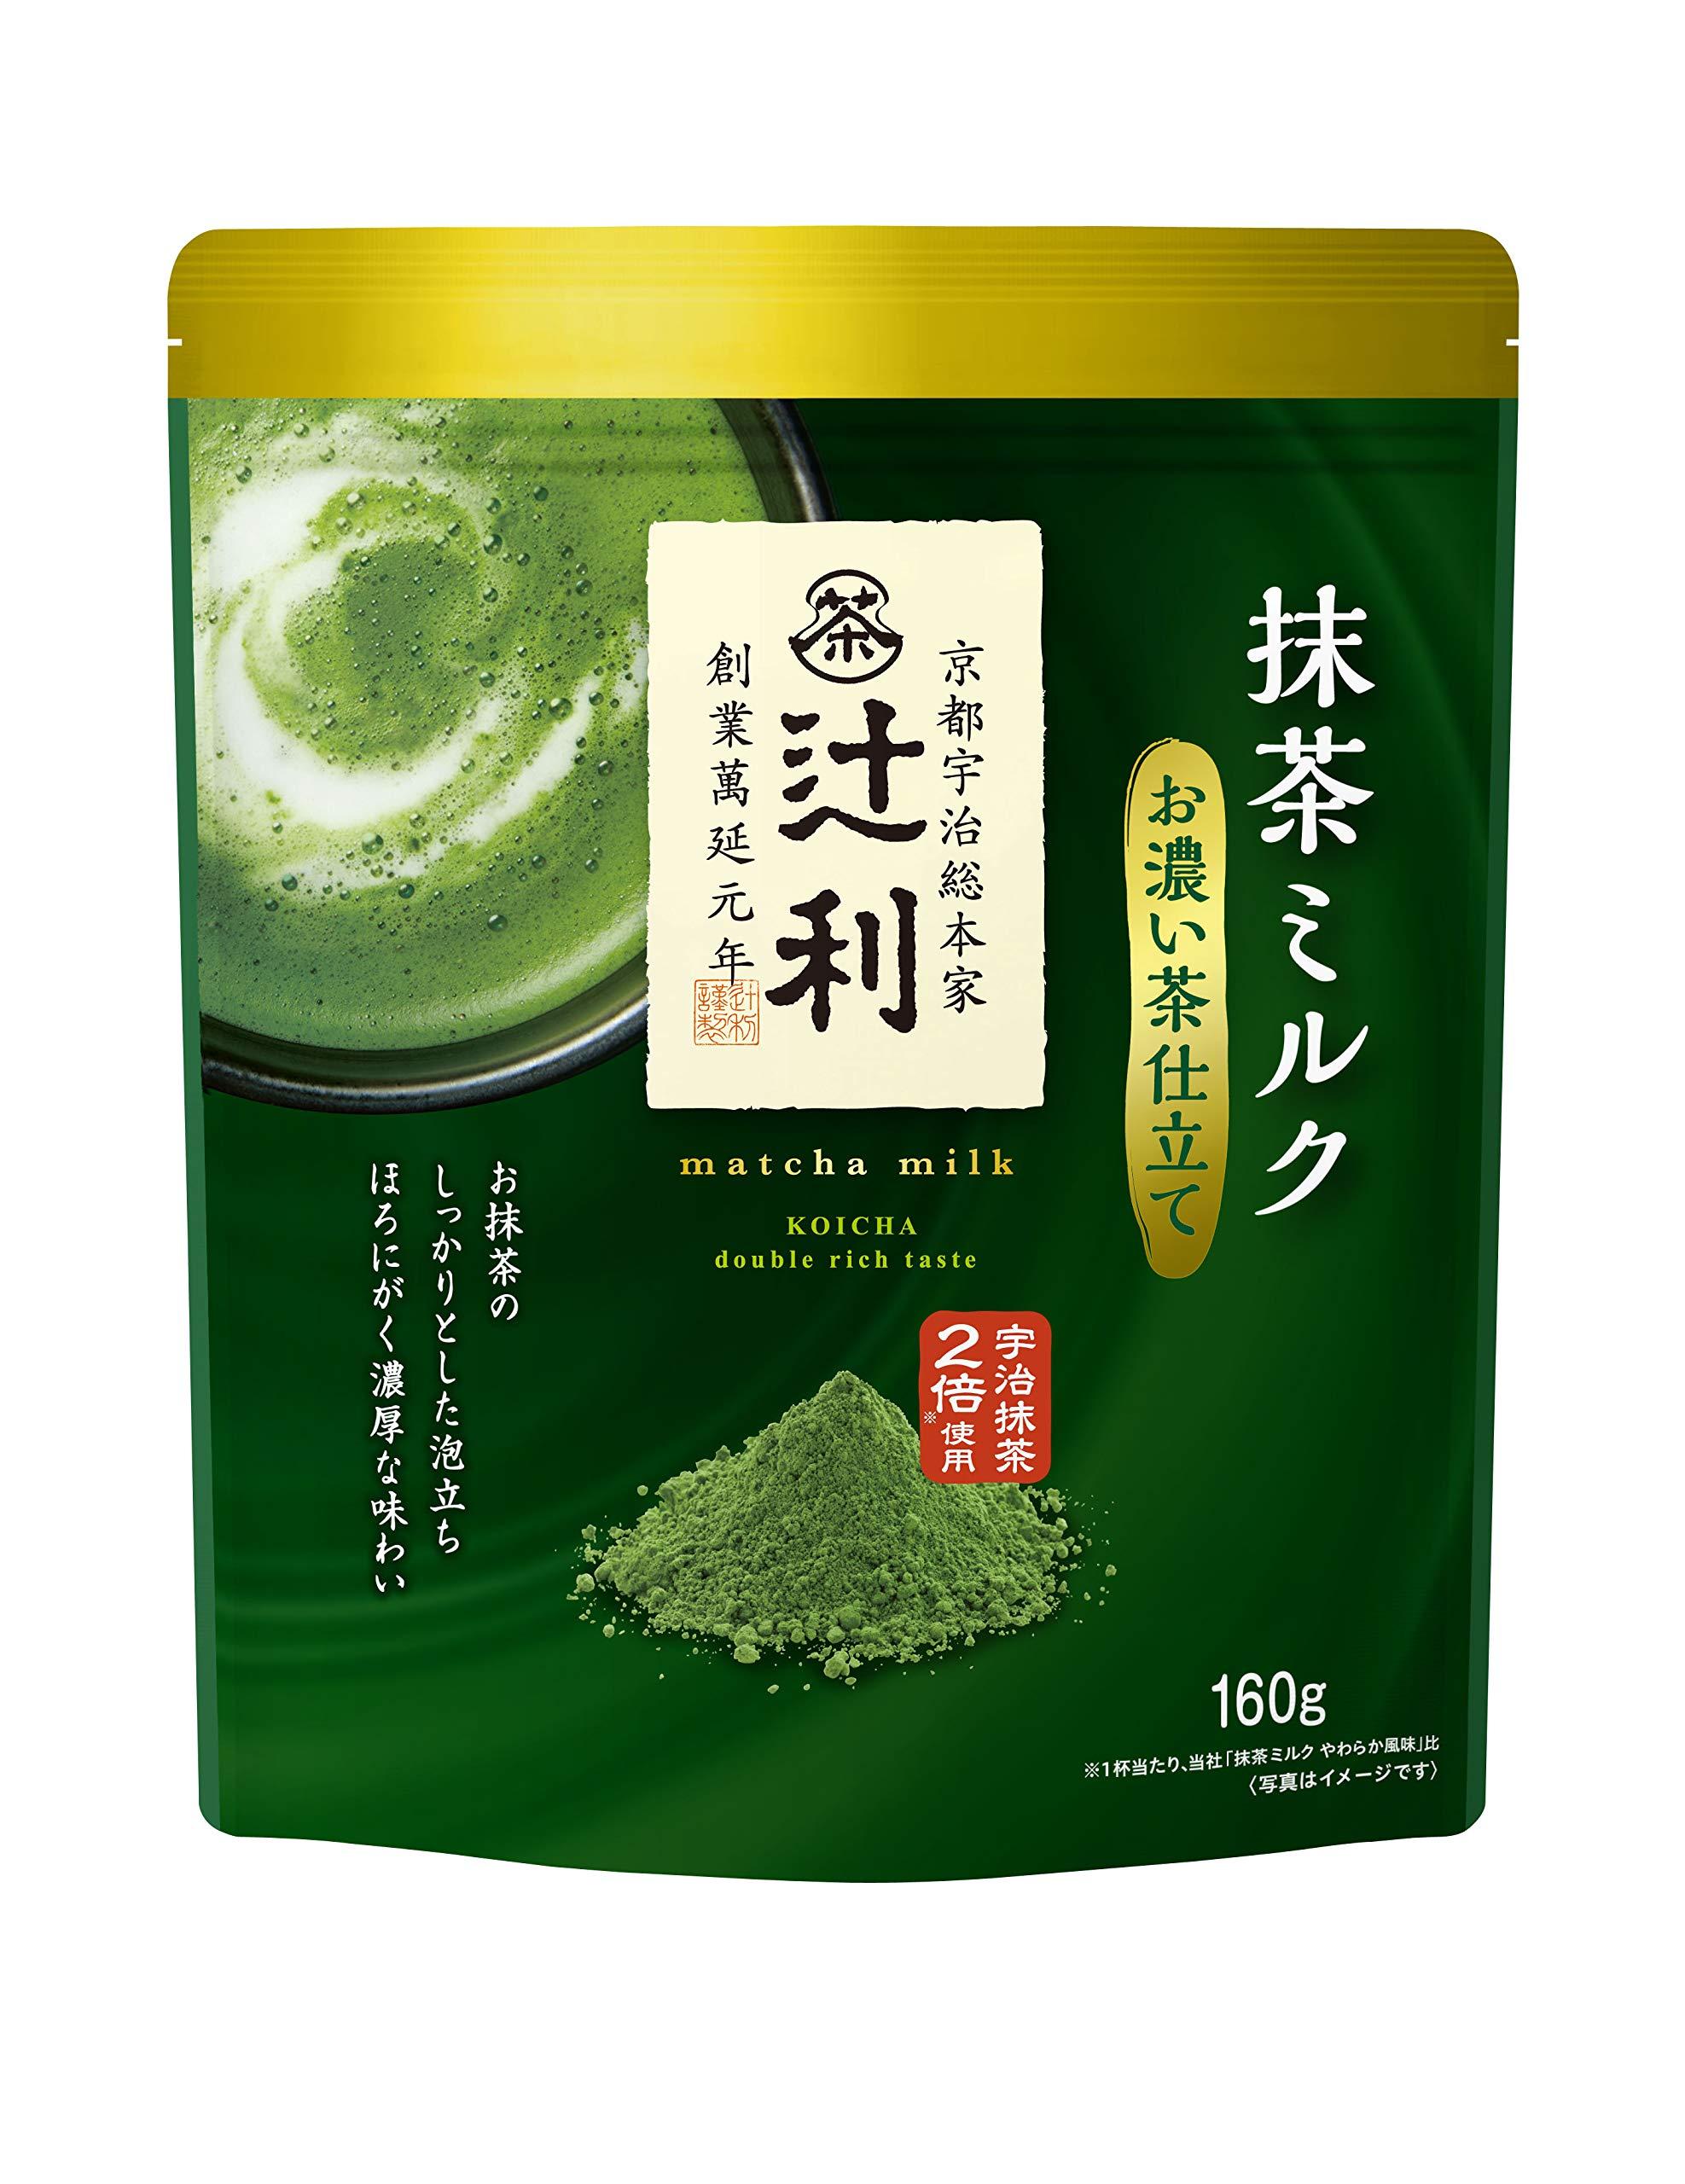 Tsujiri Green tea milk dark tea tailored 160g × 3 bags [Japan Import]